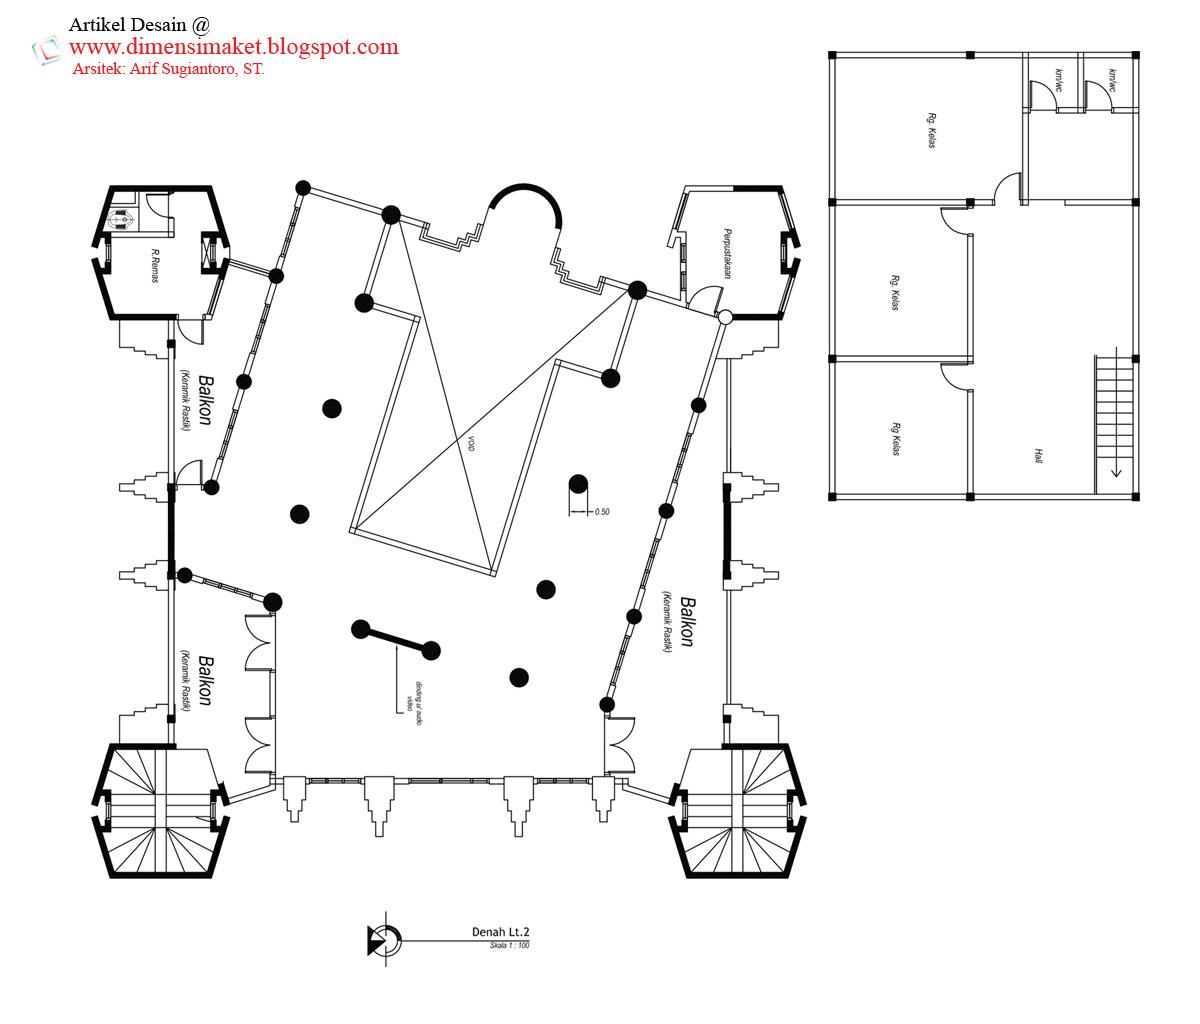 Image Result For Denah Lokasi Masjid